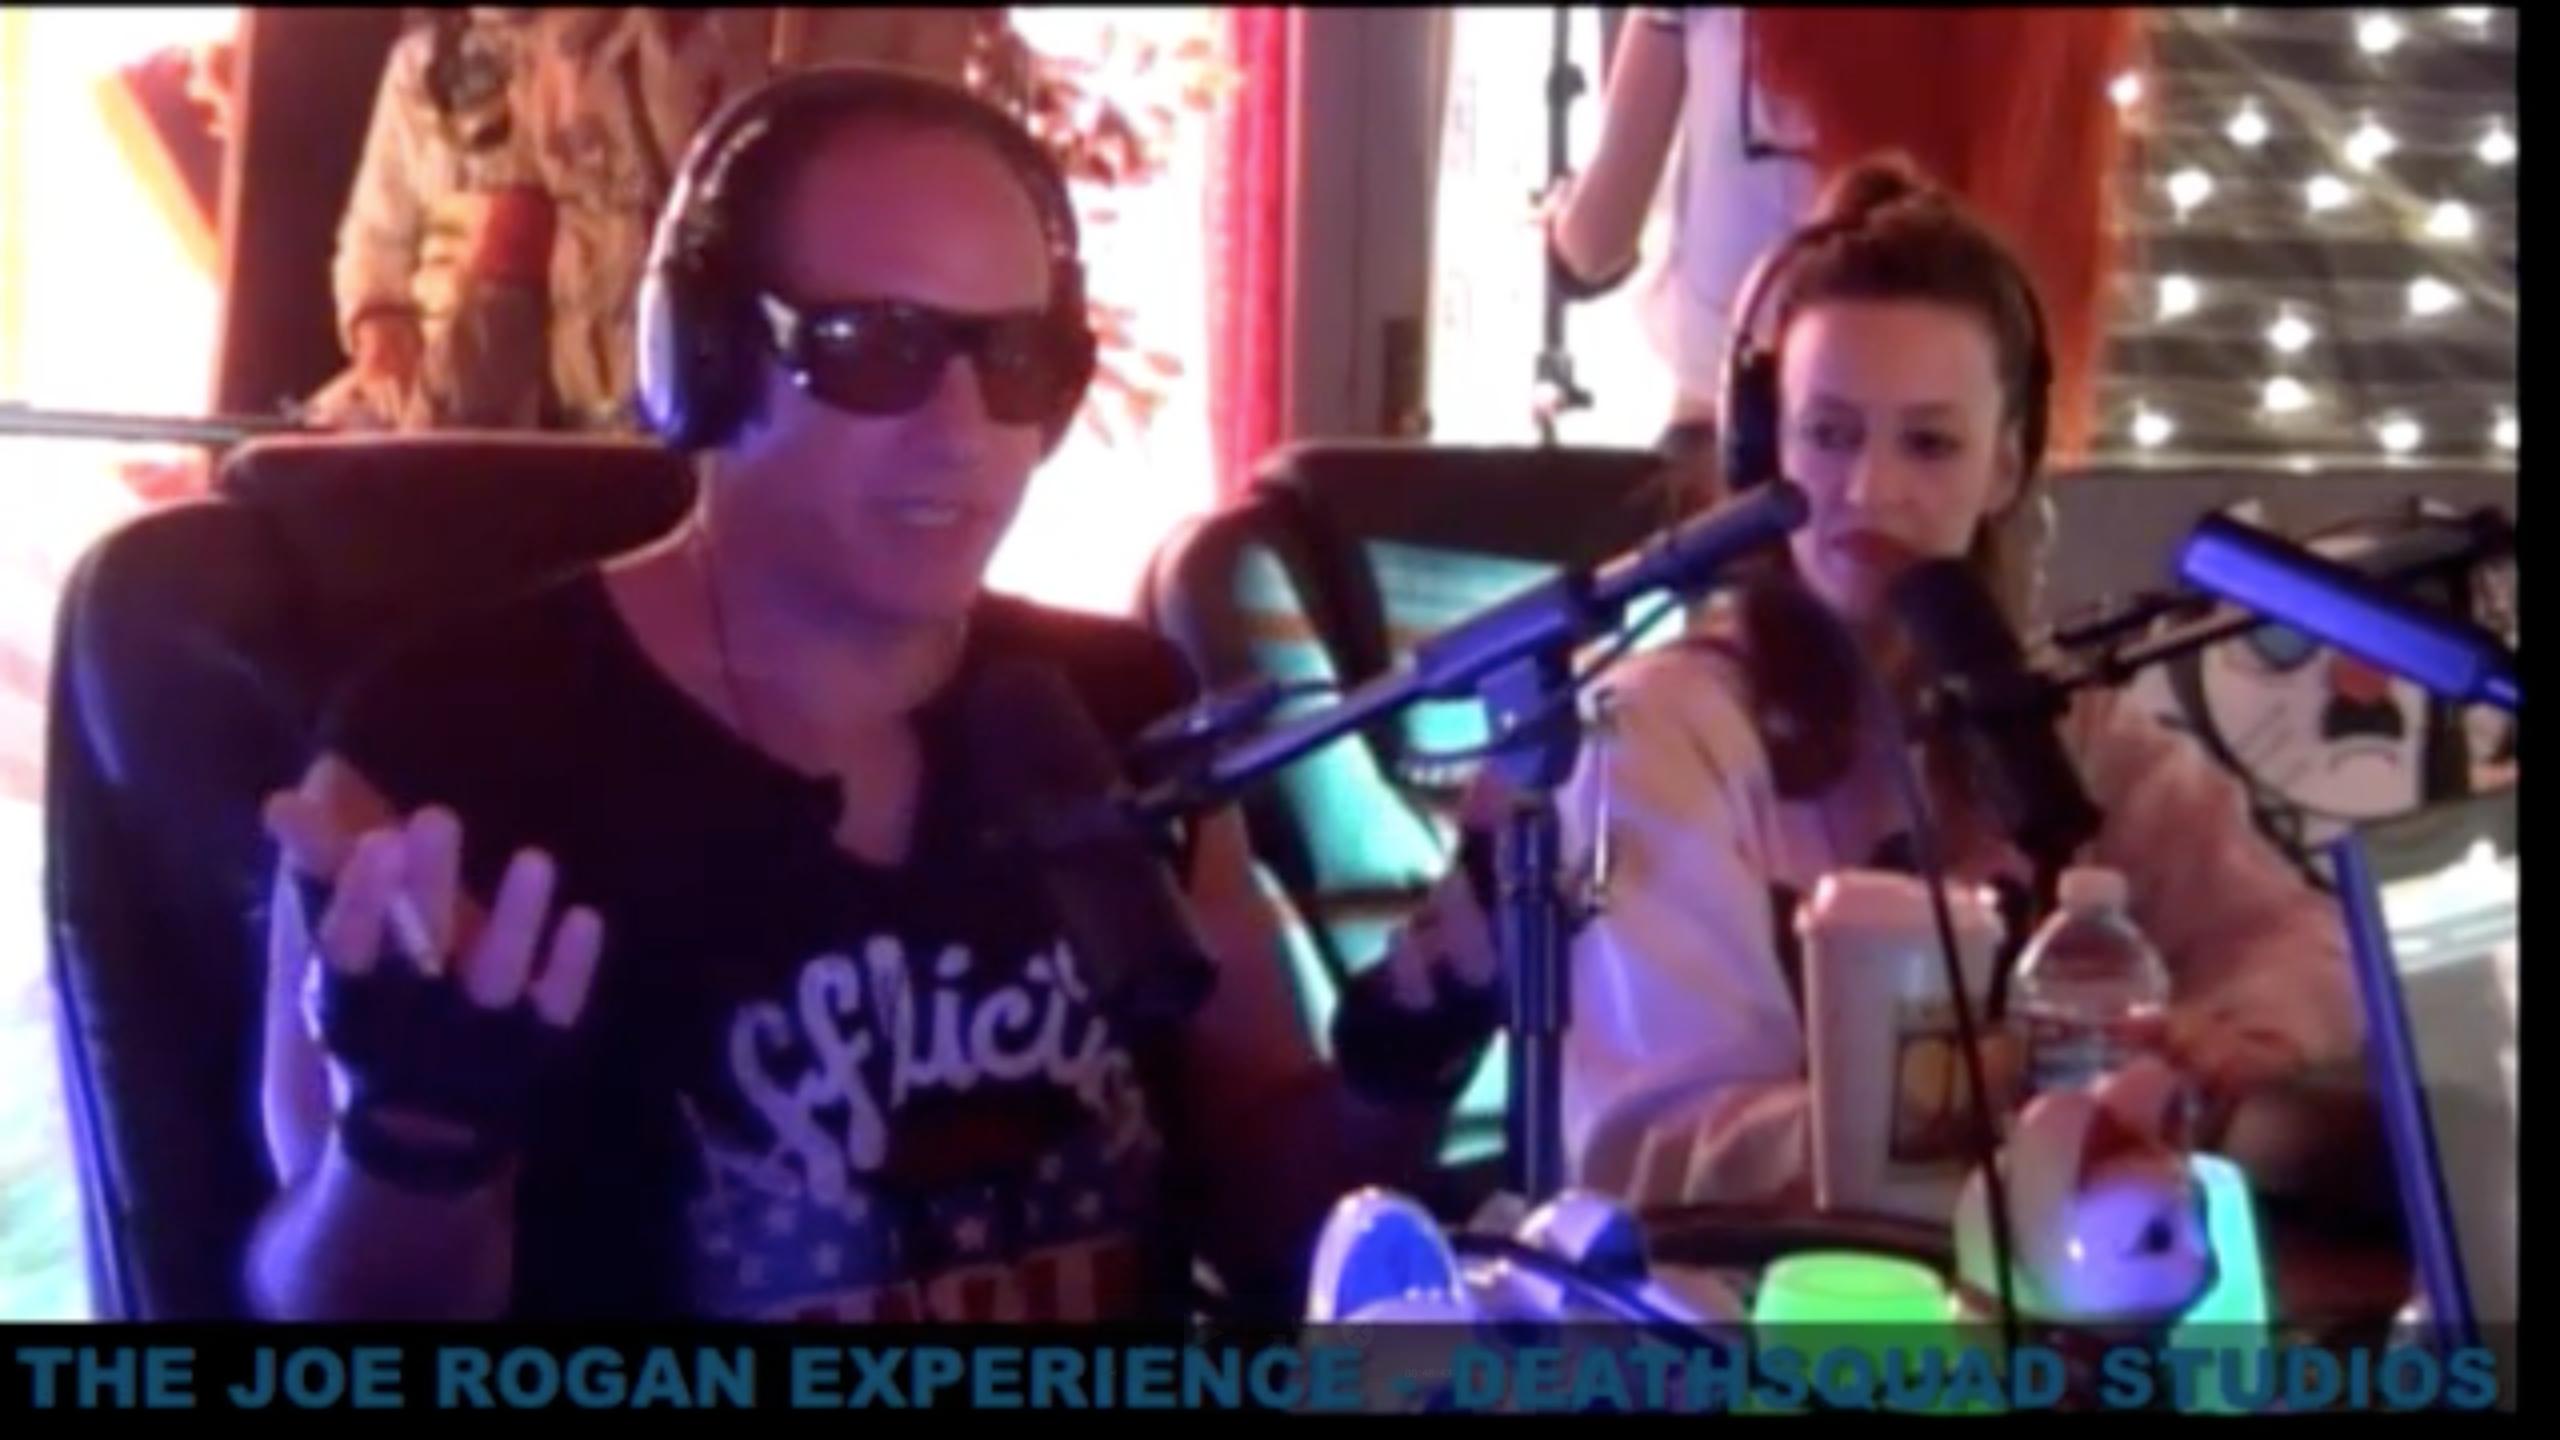 The Joe Rogan Experience #253 - Andrew Dice Clay, Max Silverstein, Eleanor J. Kerrigan, Brian Redban